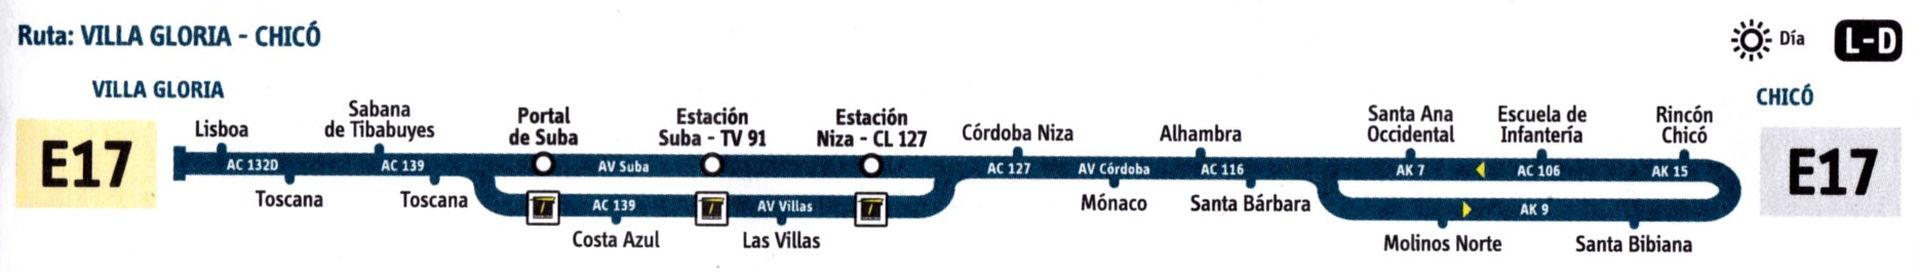 Ruta SITP: E17 Villa Gloria ↔ Chicó [Urbana] 1